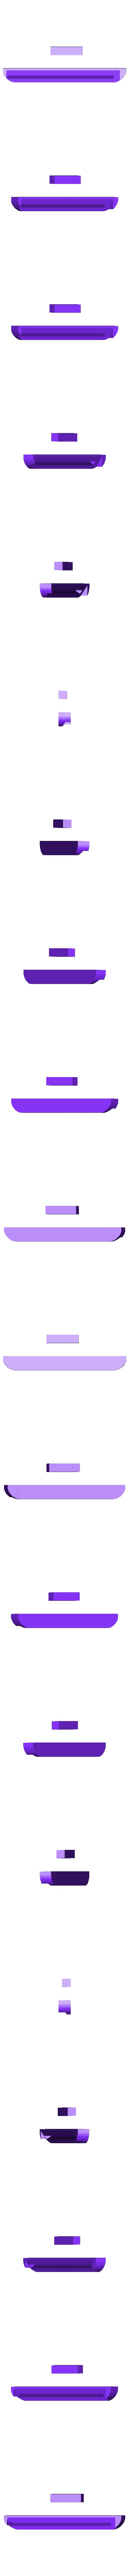 Front and back bars.stl Download STL file Keyboard arrow keys KEYSTICK gaming joystick  • 3D print template, lap88777